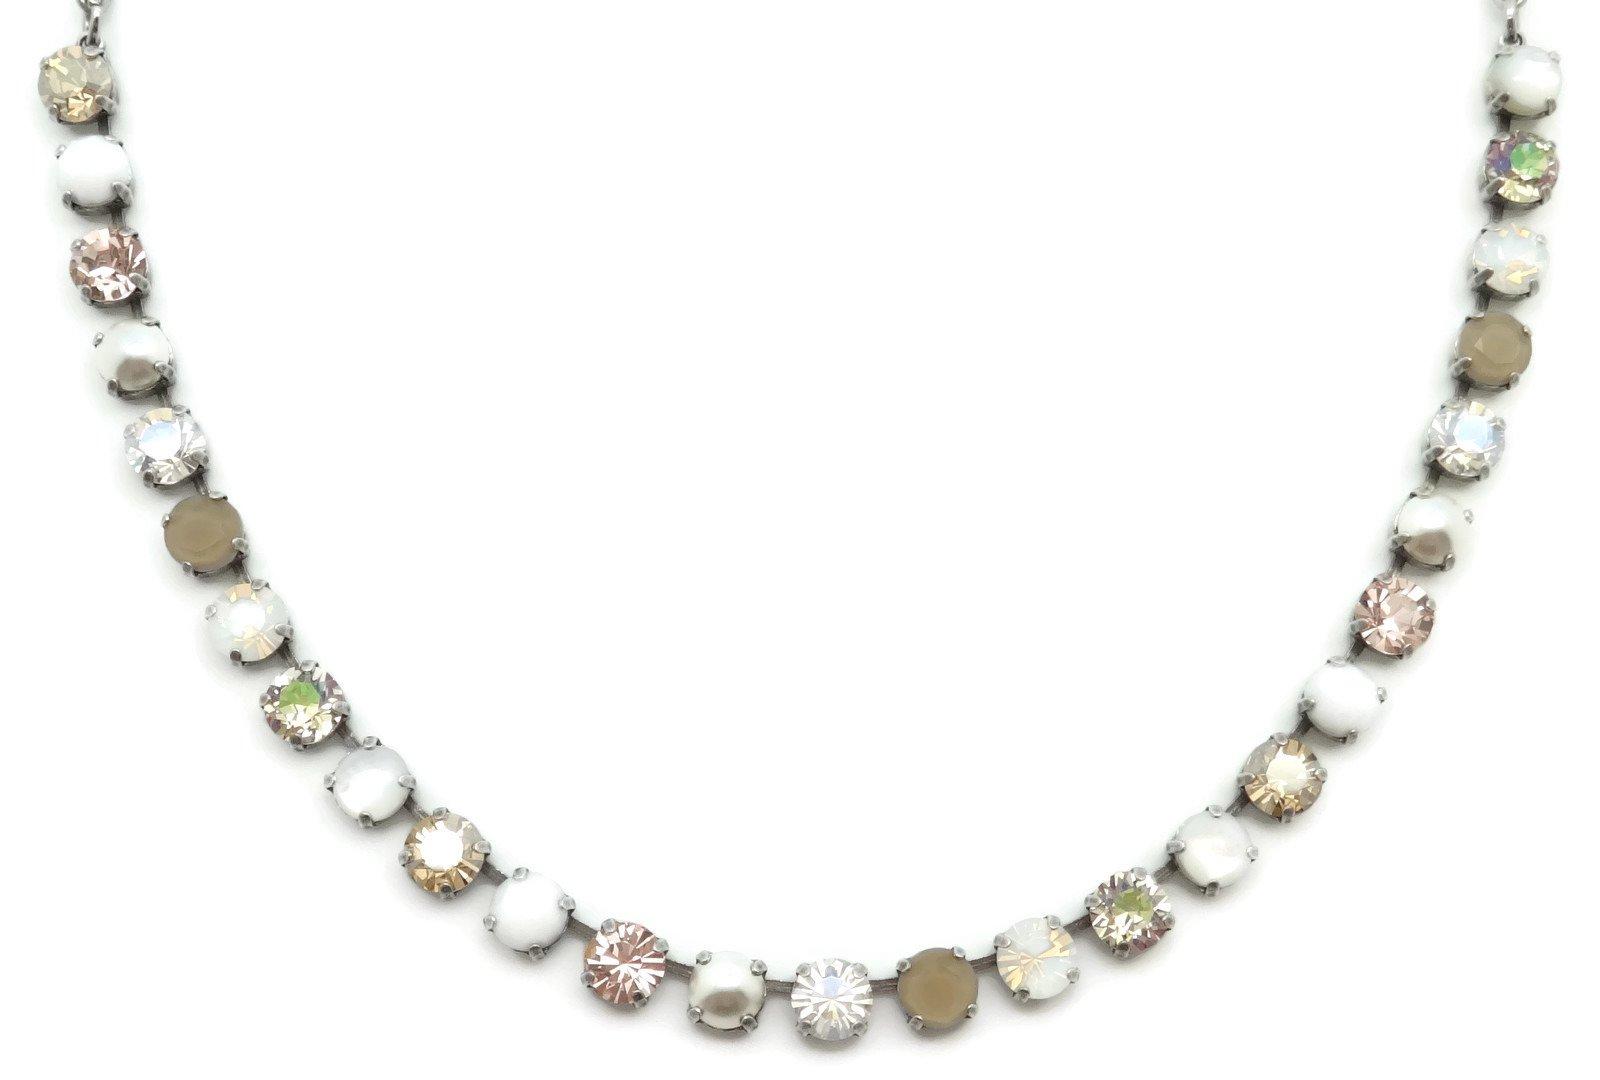 Mariana Swarovski Crystal Silver Plated Necklace Peach White Taupe Strand M1078 Kalahari